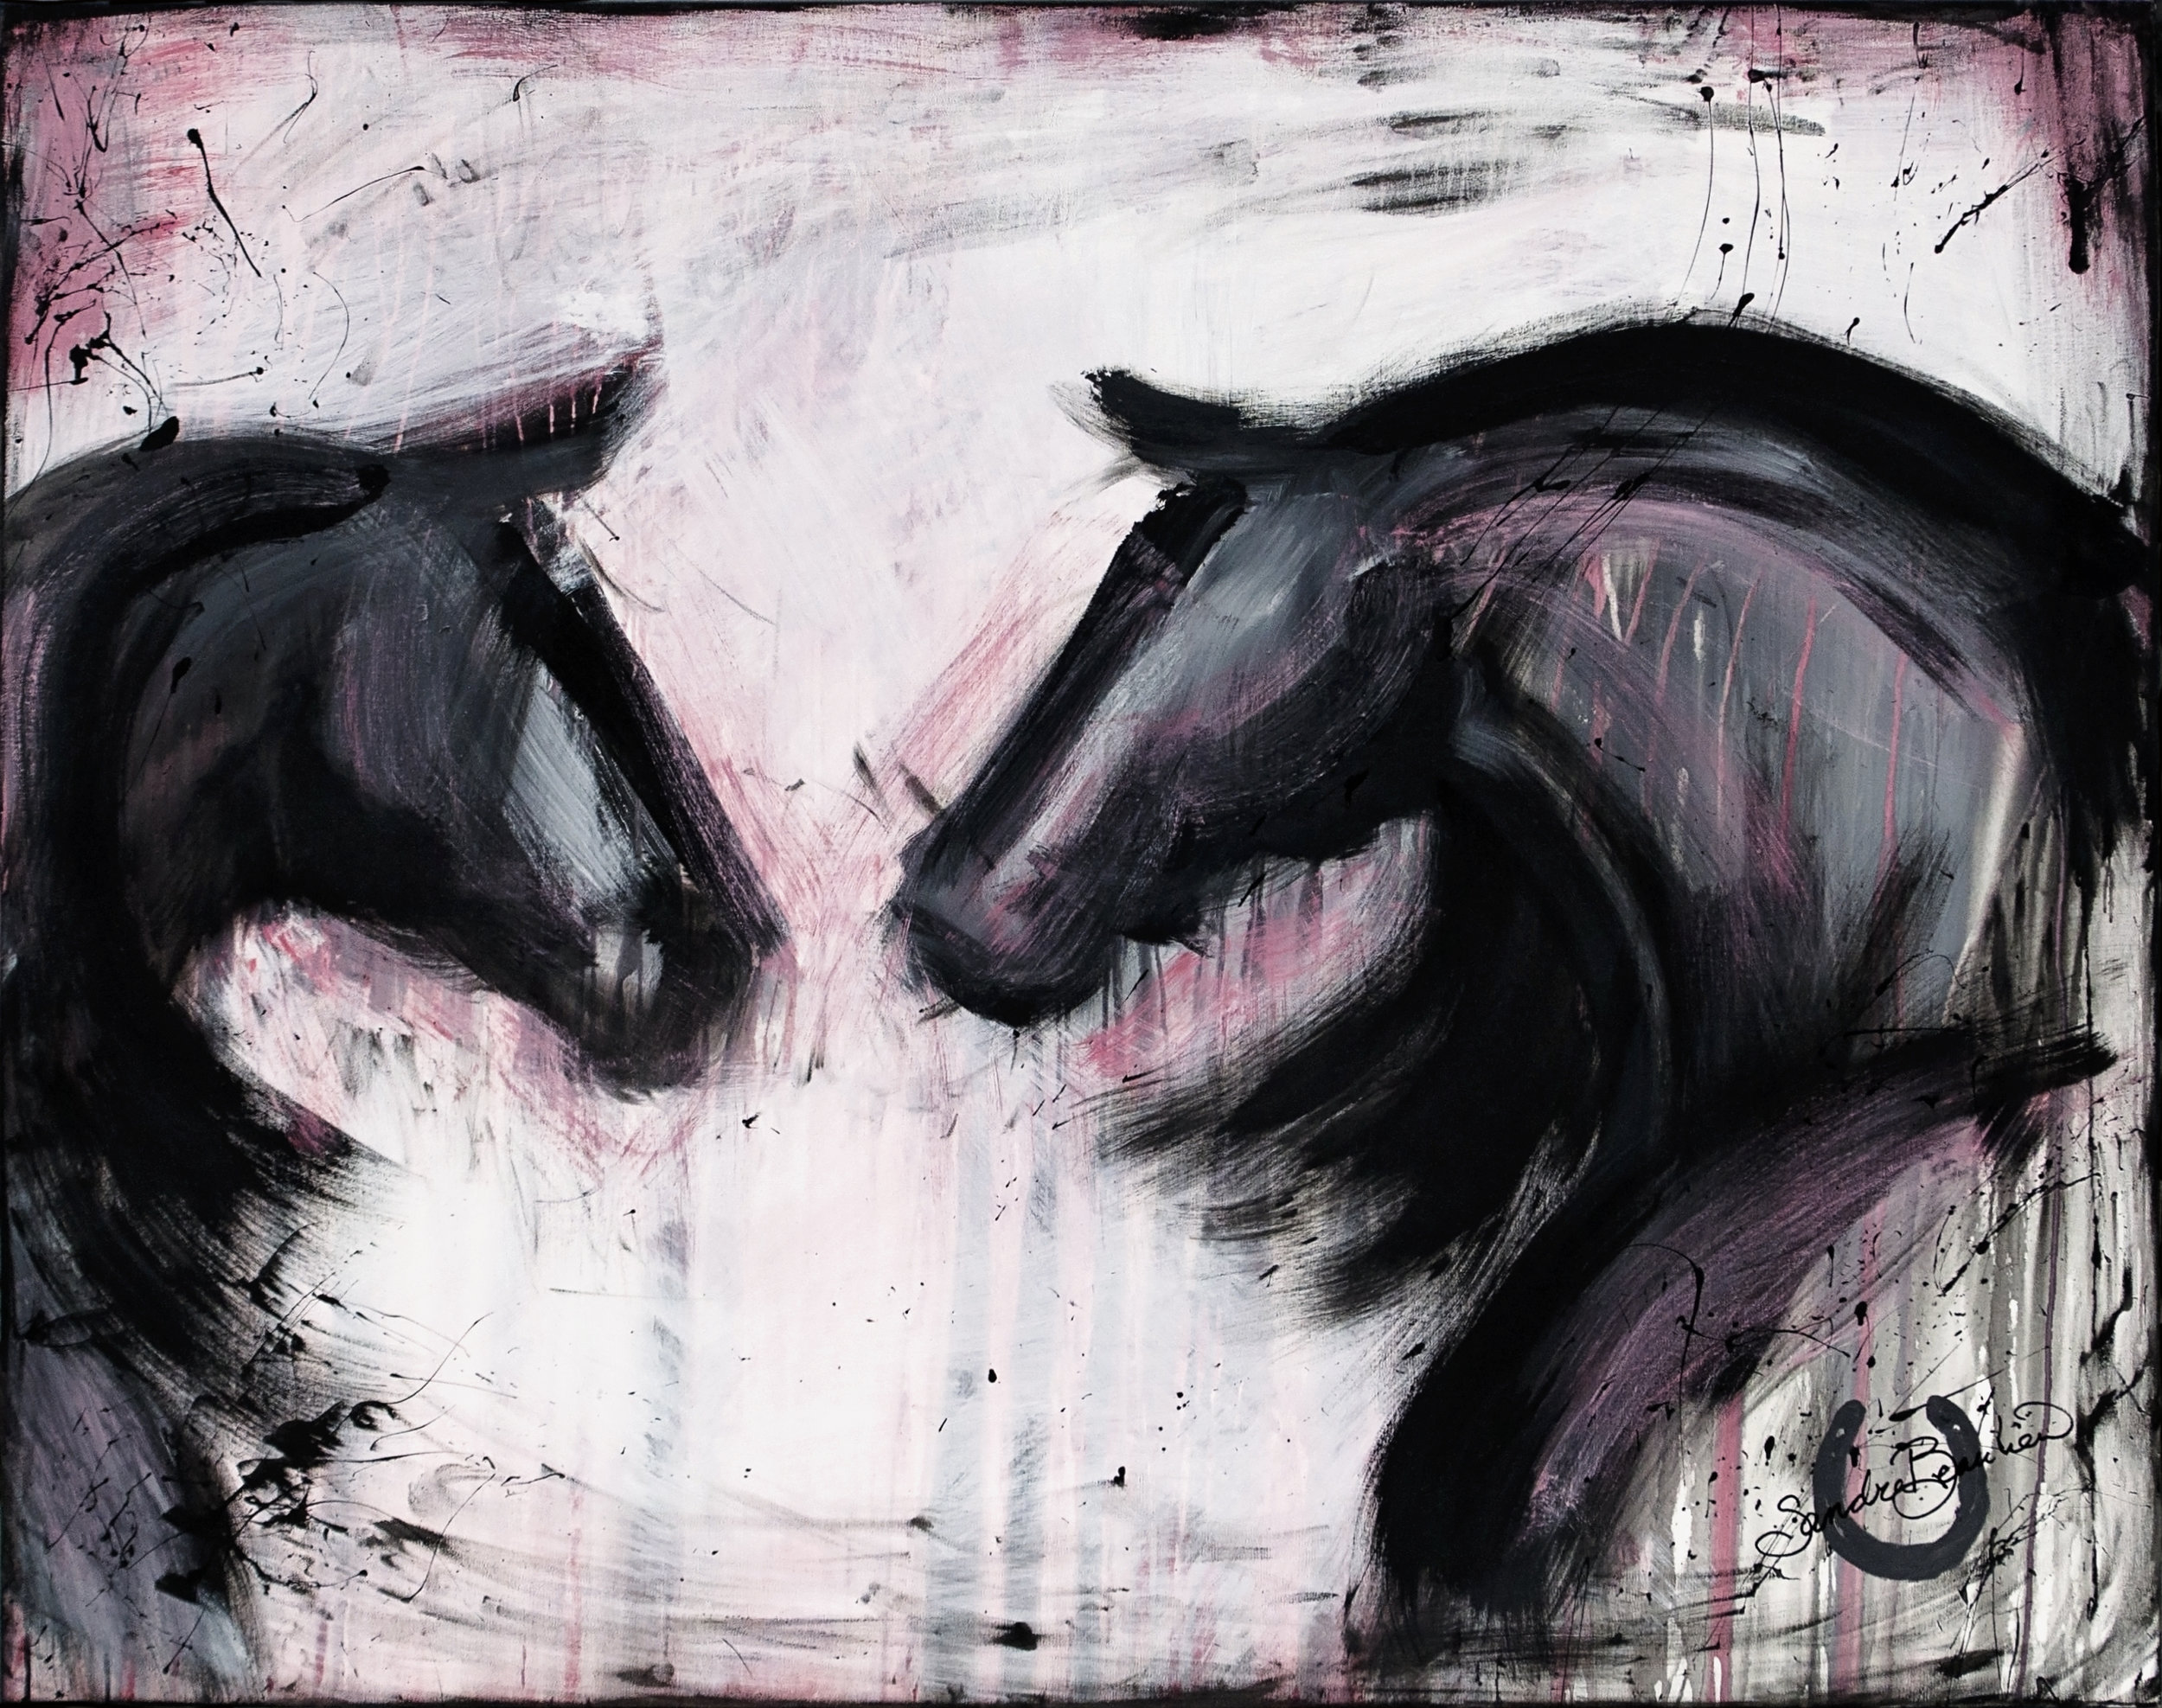 Equus Amore - Art on Horseback #8